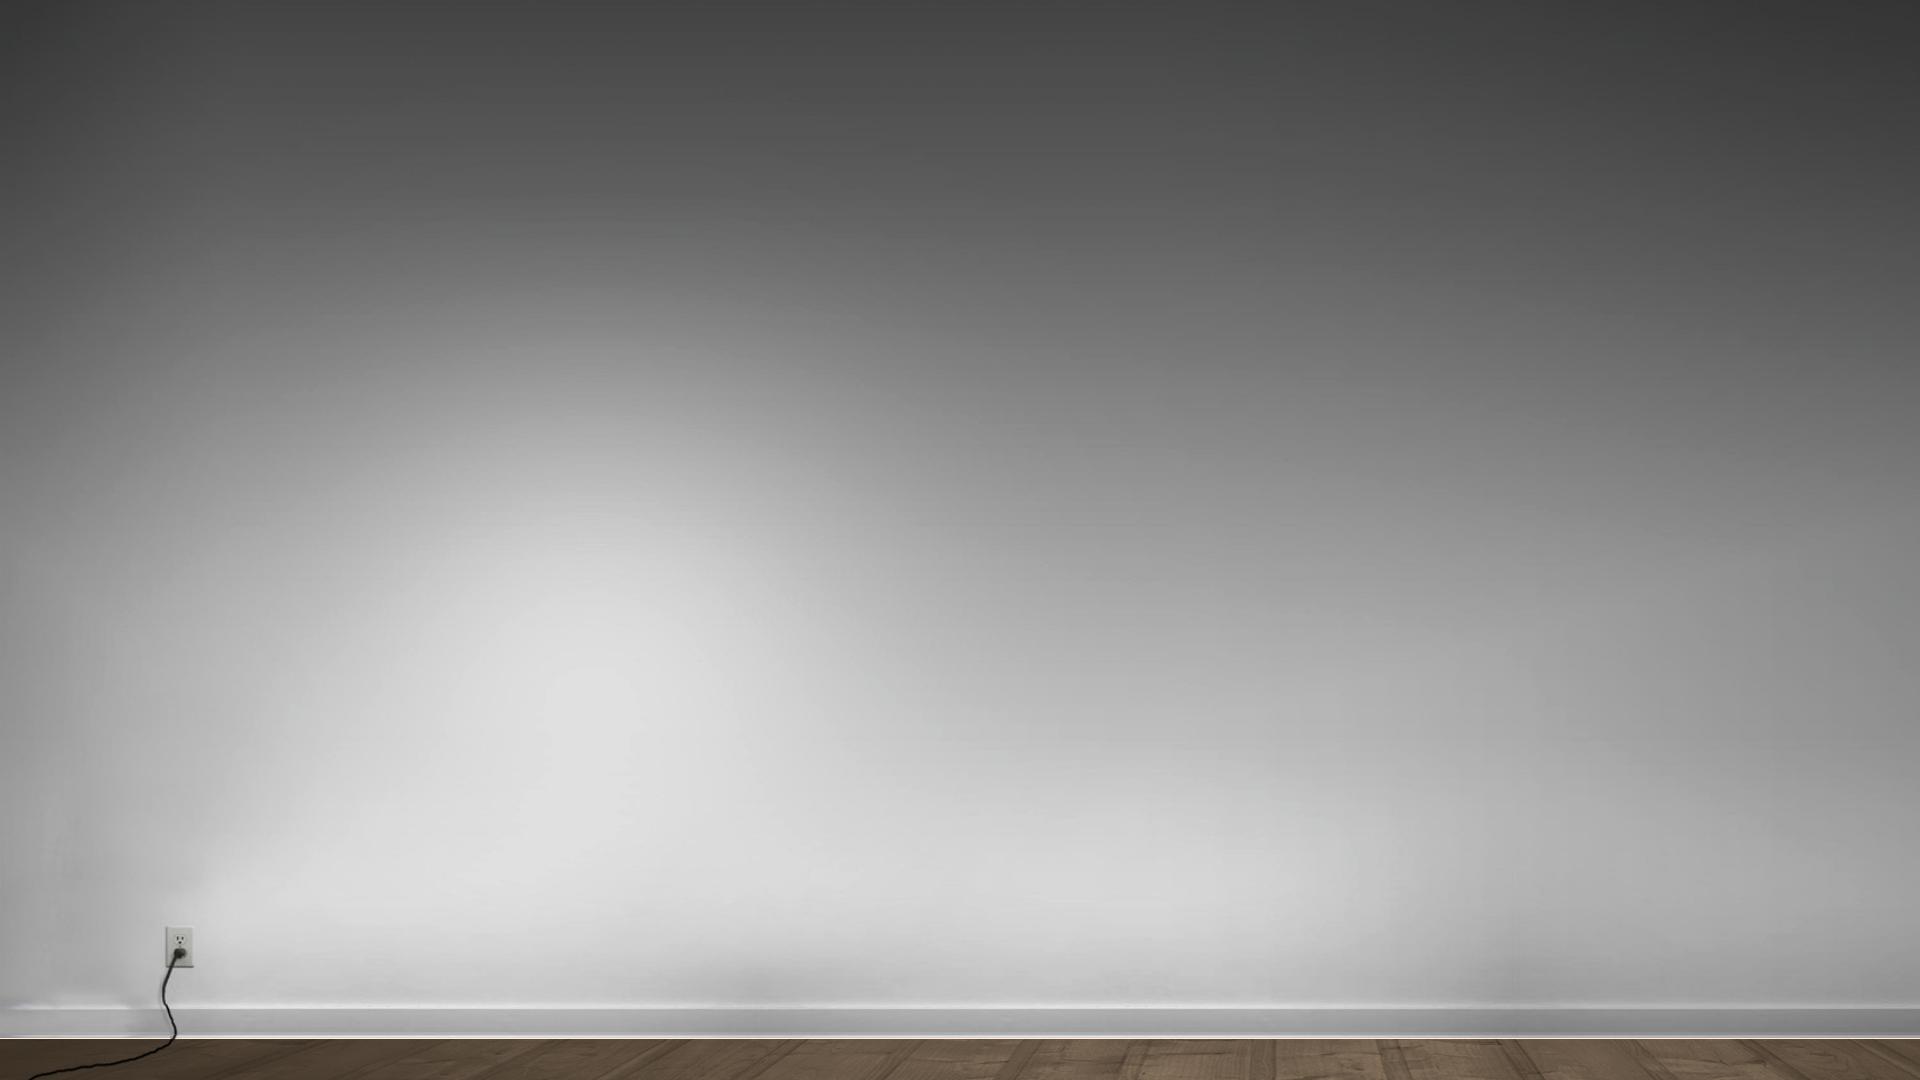 Minimal Wallpaper Hd wallpaper - 982465